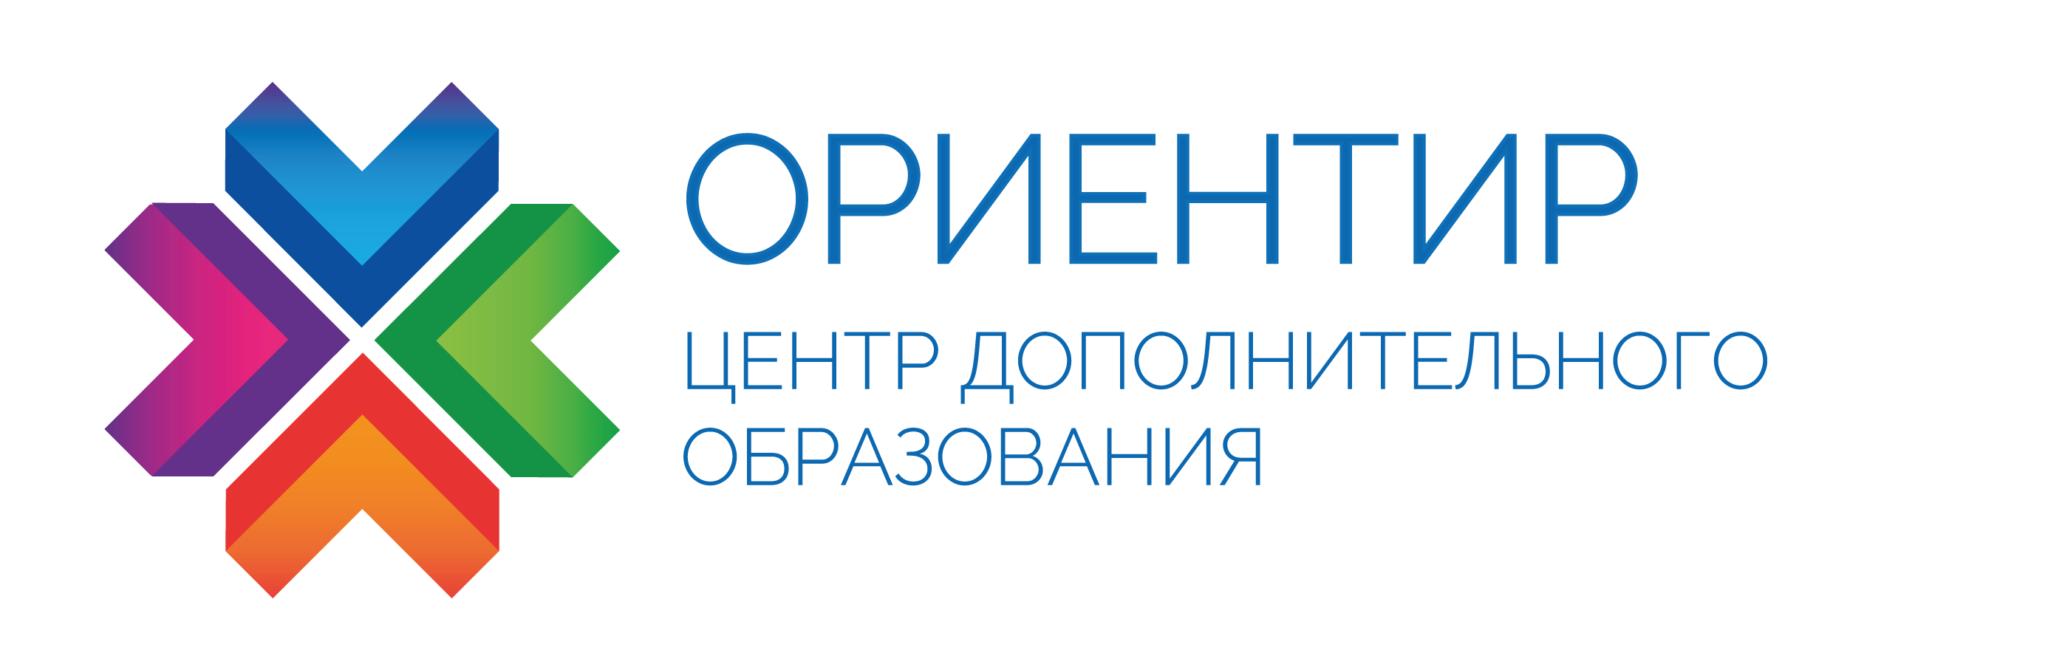 Аттестация педагогов - Eduface.ru